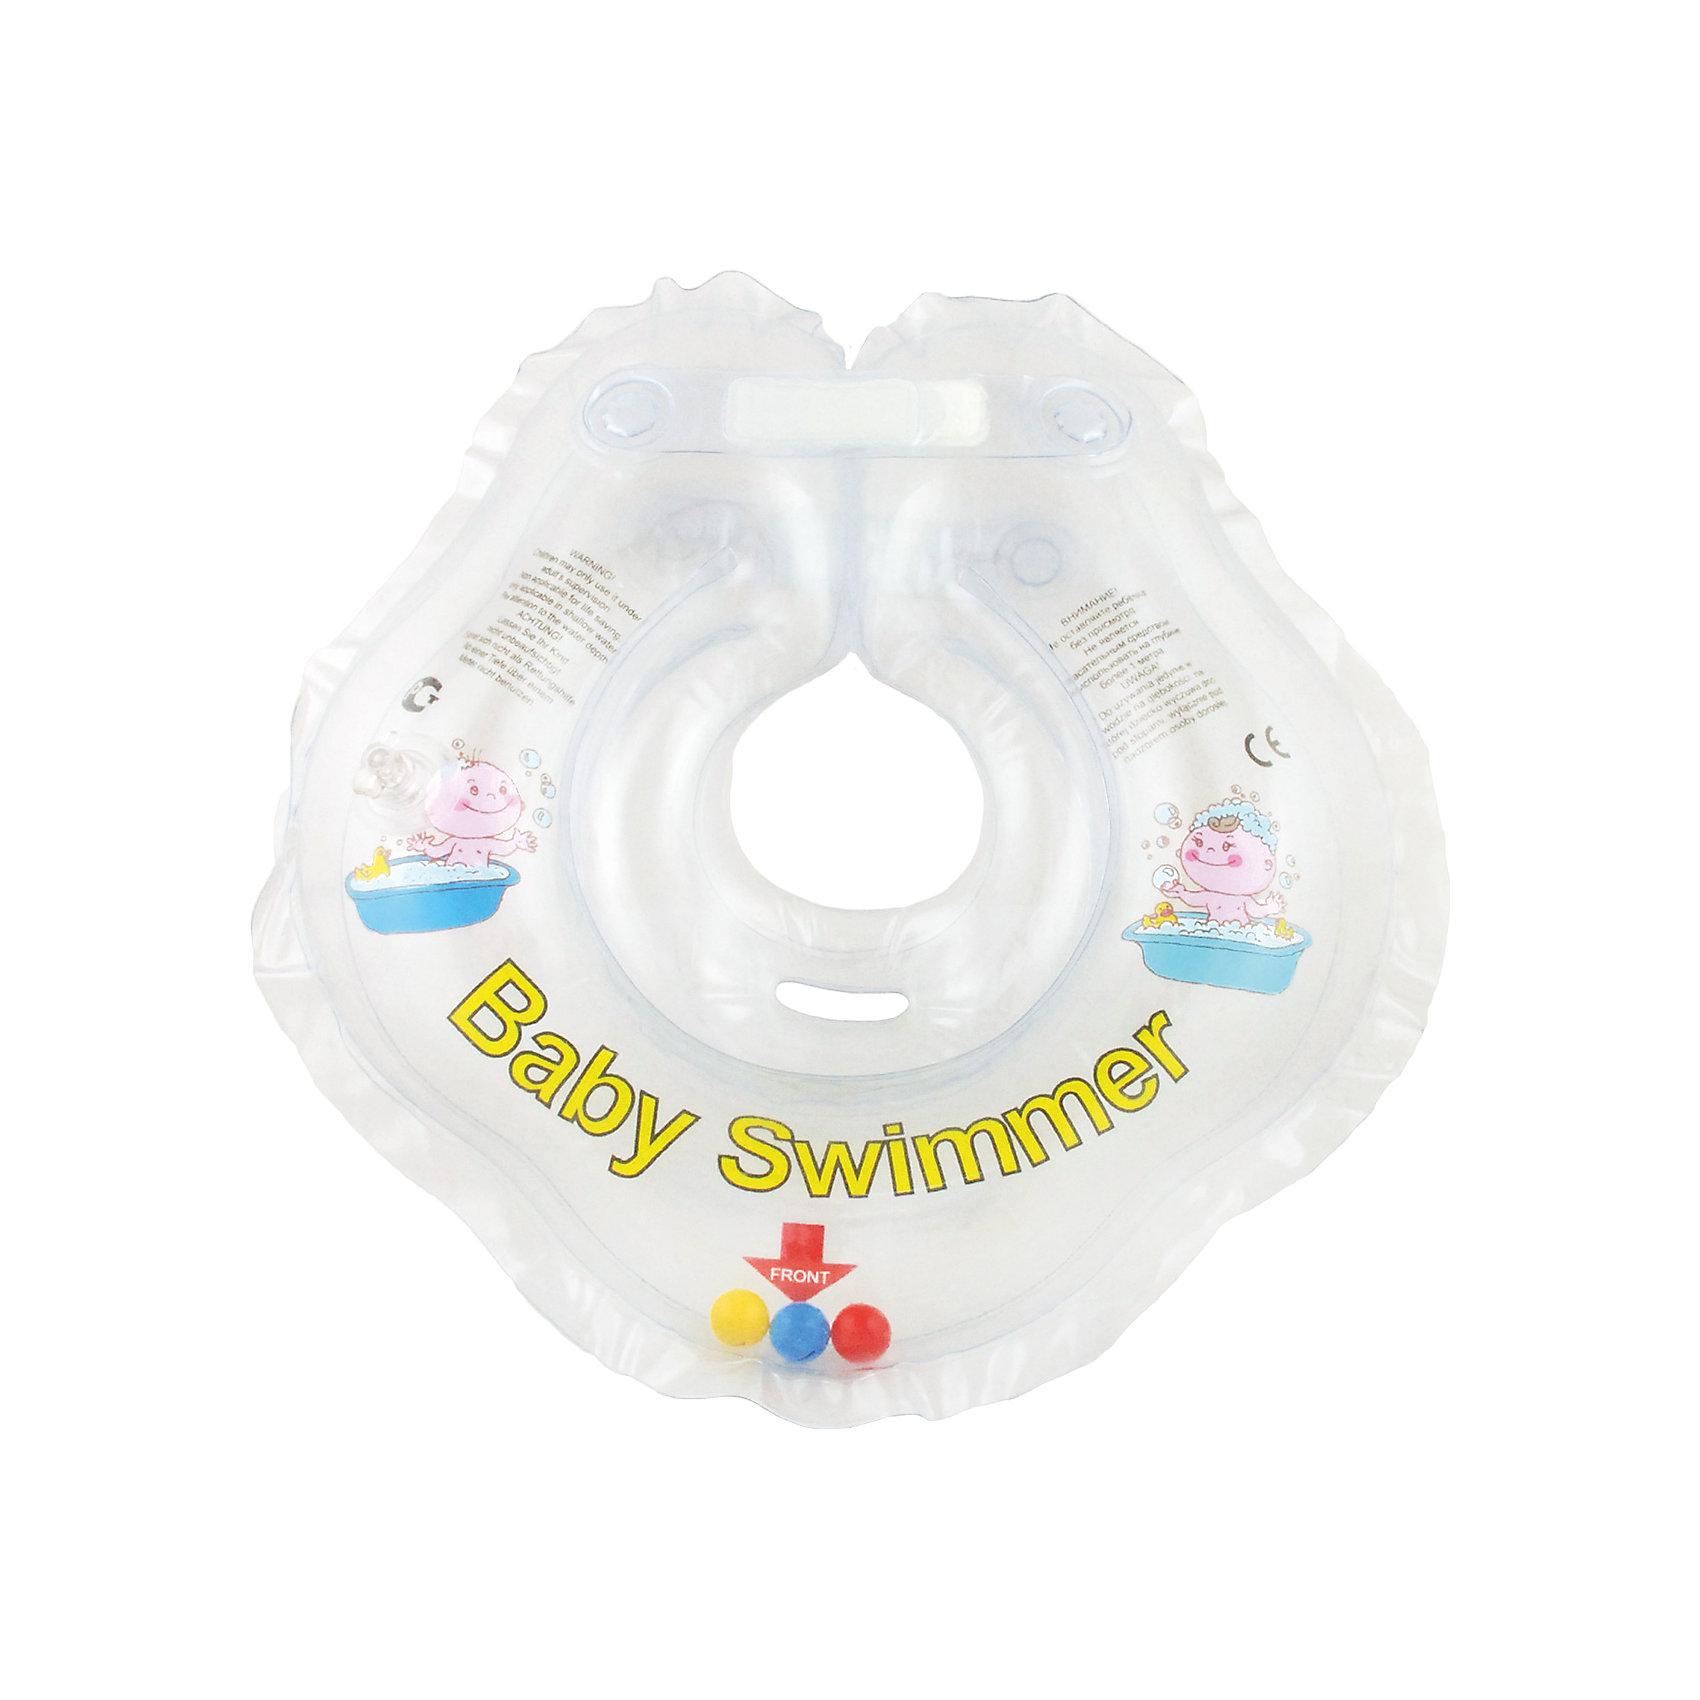 Baby Swimmer Круг для купания с погремушкой внутри BabySwimmer, прозрачный круг для купания baby swimmer bs02y